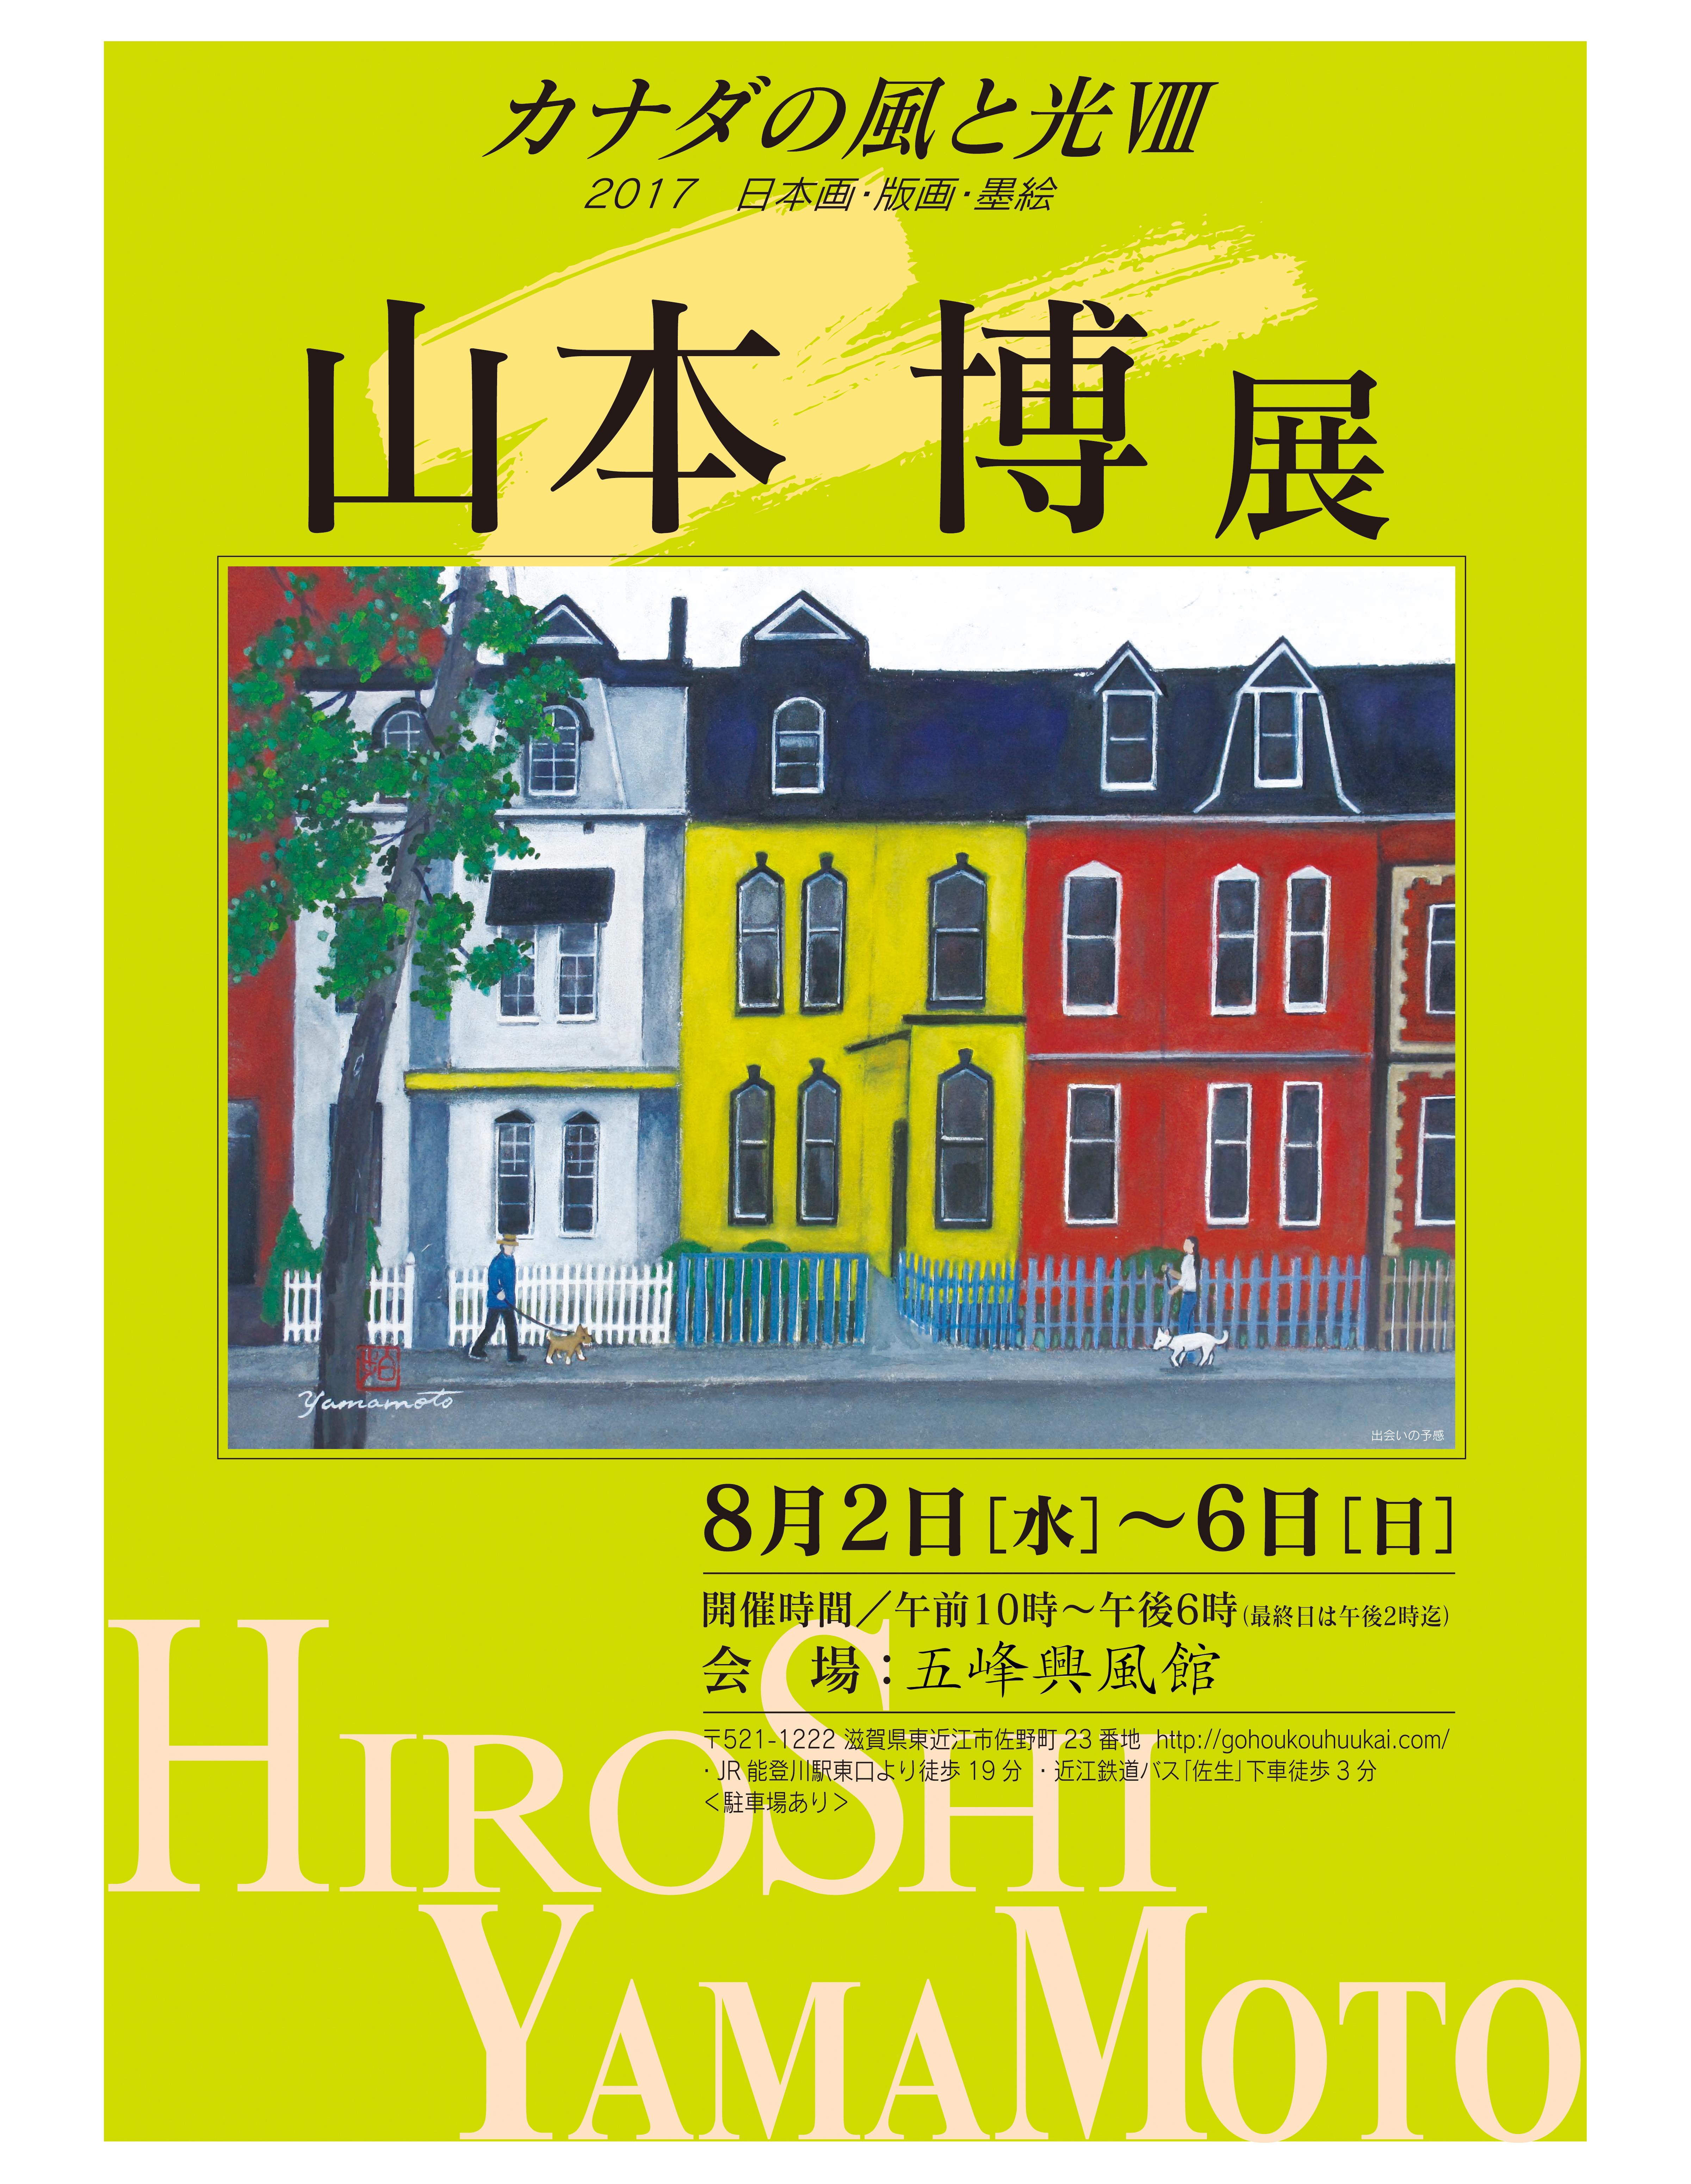 Hiroshi Yamamoto - Gohou Kuufuukai Aug 2-6 2017